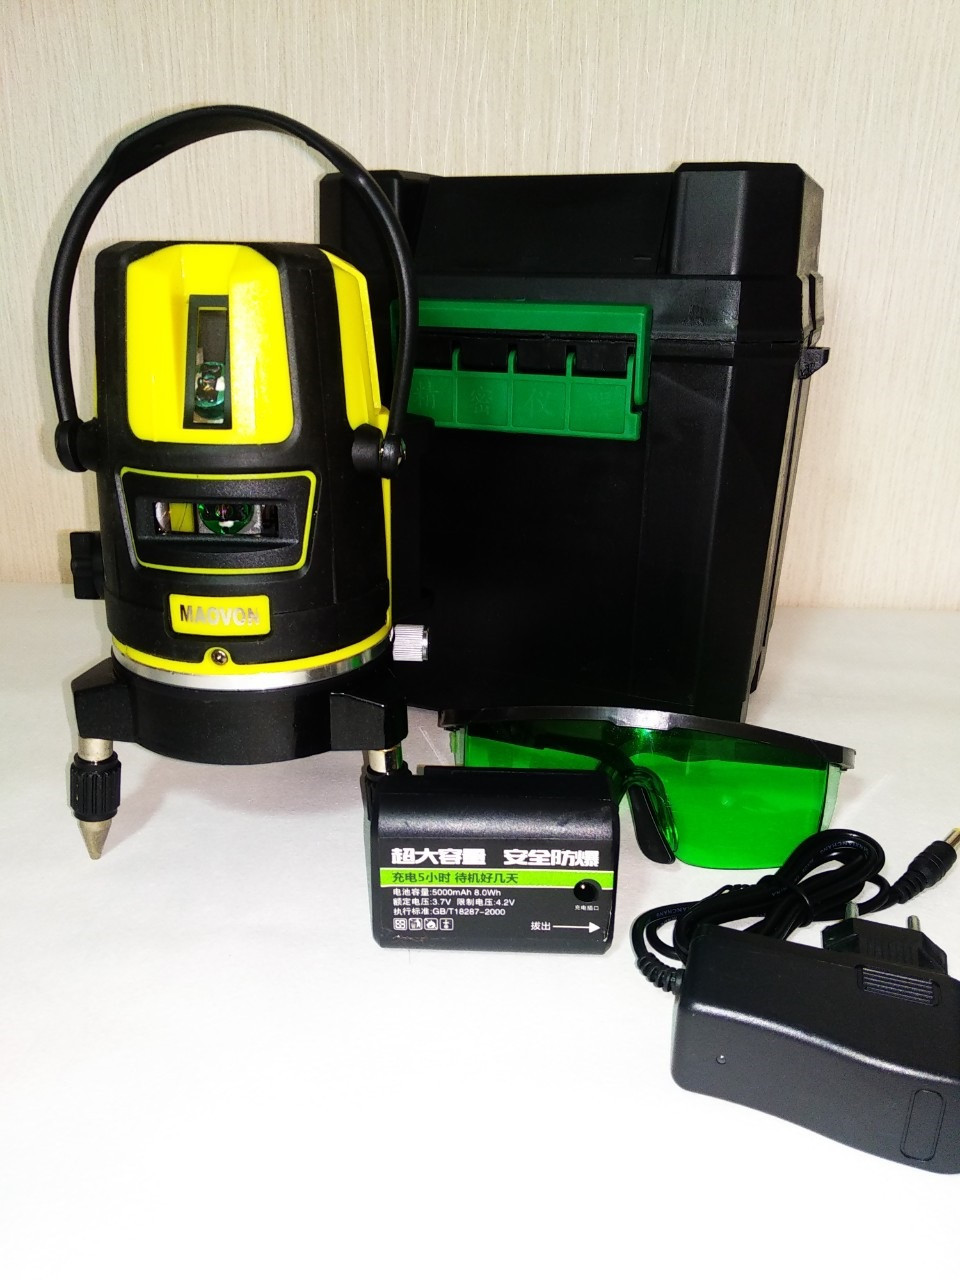 NEW 19-Лазерный уровень MAOVON 5 линий зеленый луч-5000mA Li-ion аккумулятор